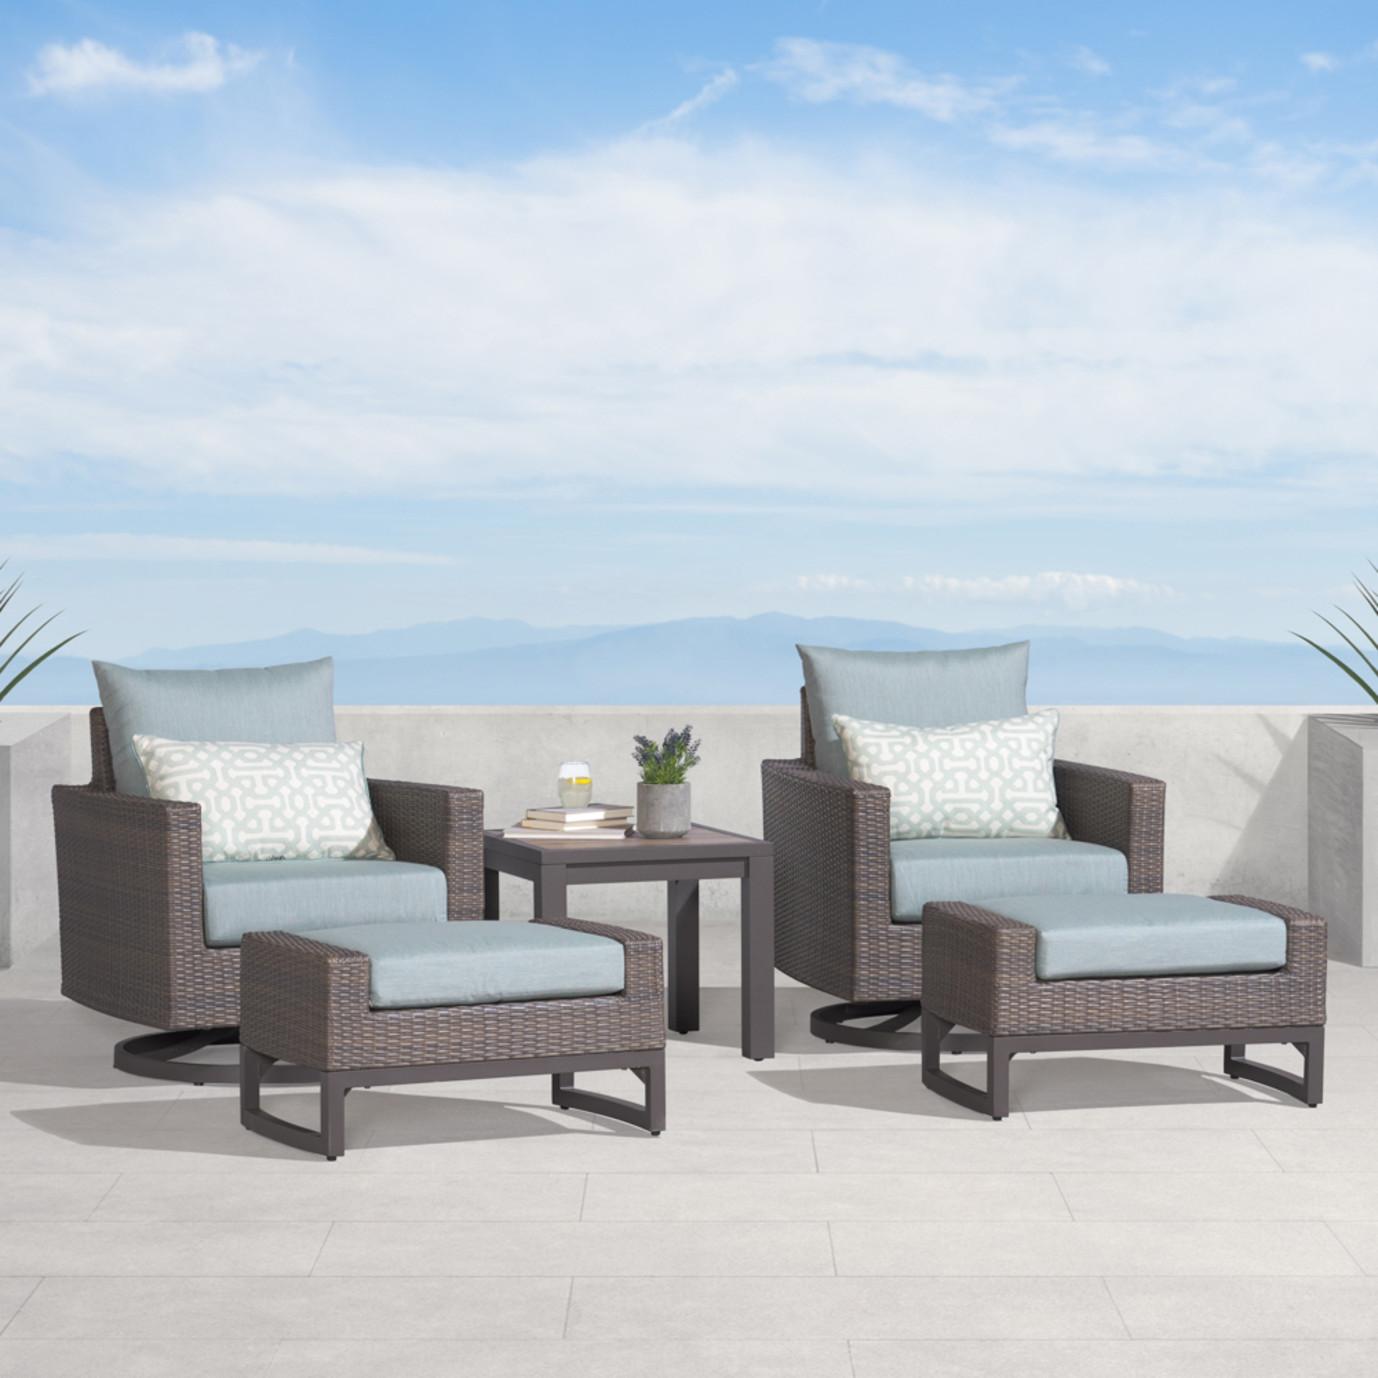 Milea 5 Piece Club Seating Set - Mist Blue